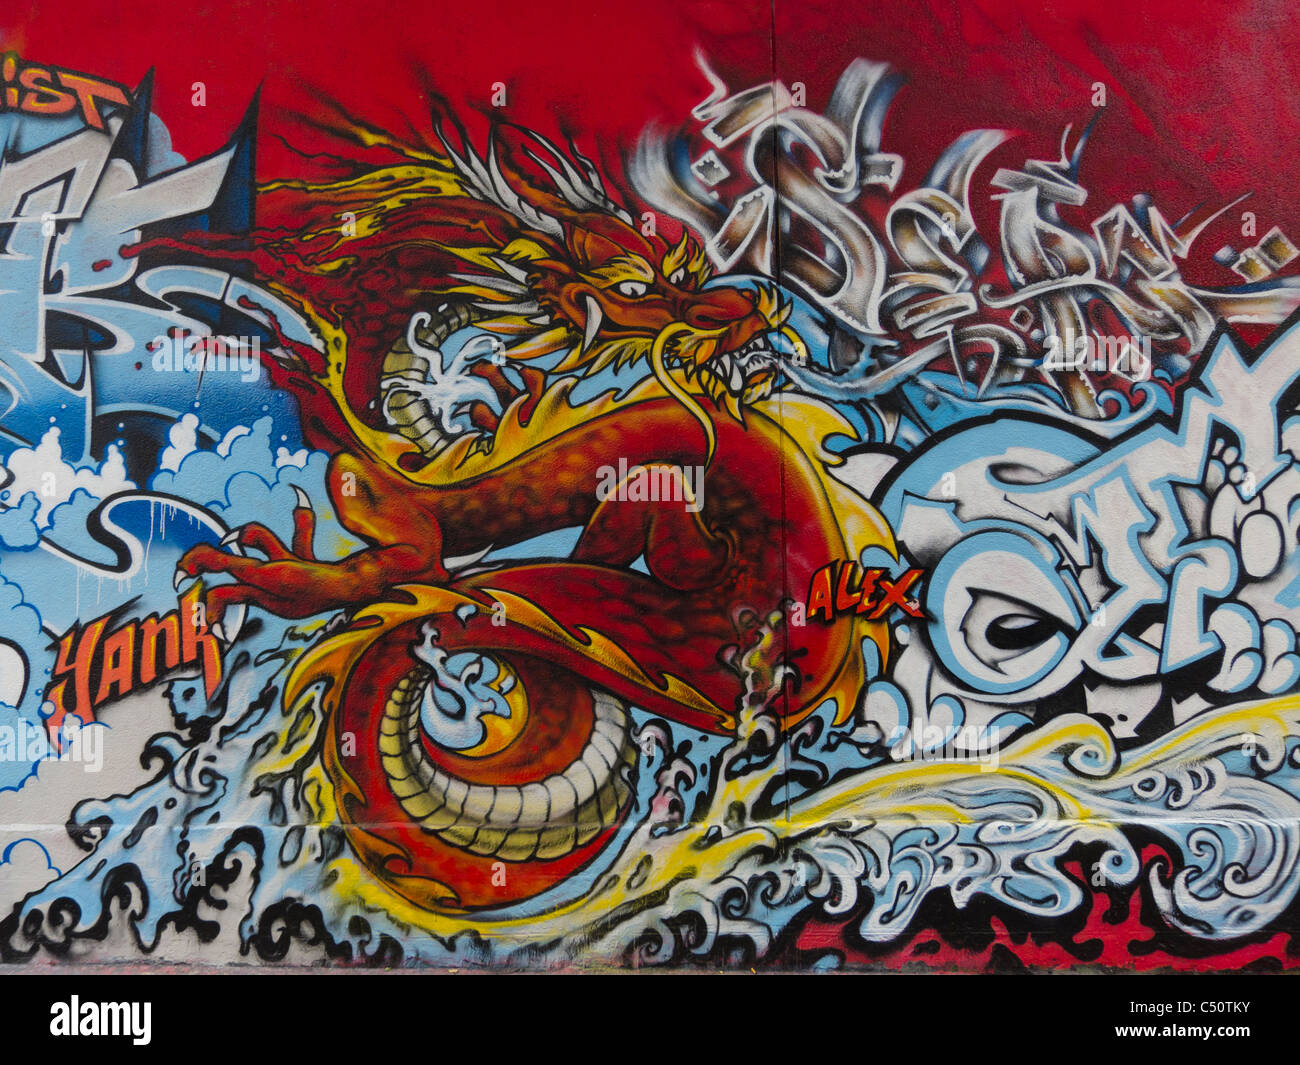 Paris, Frankreich, Graffiti-Künstler Gemälde Wallstreet, asiatischen Drachen Grafik Illustration, Kunst Stockbild